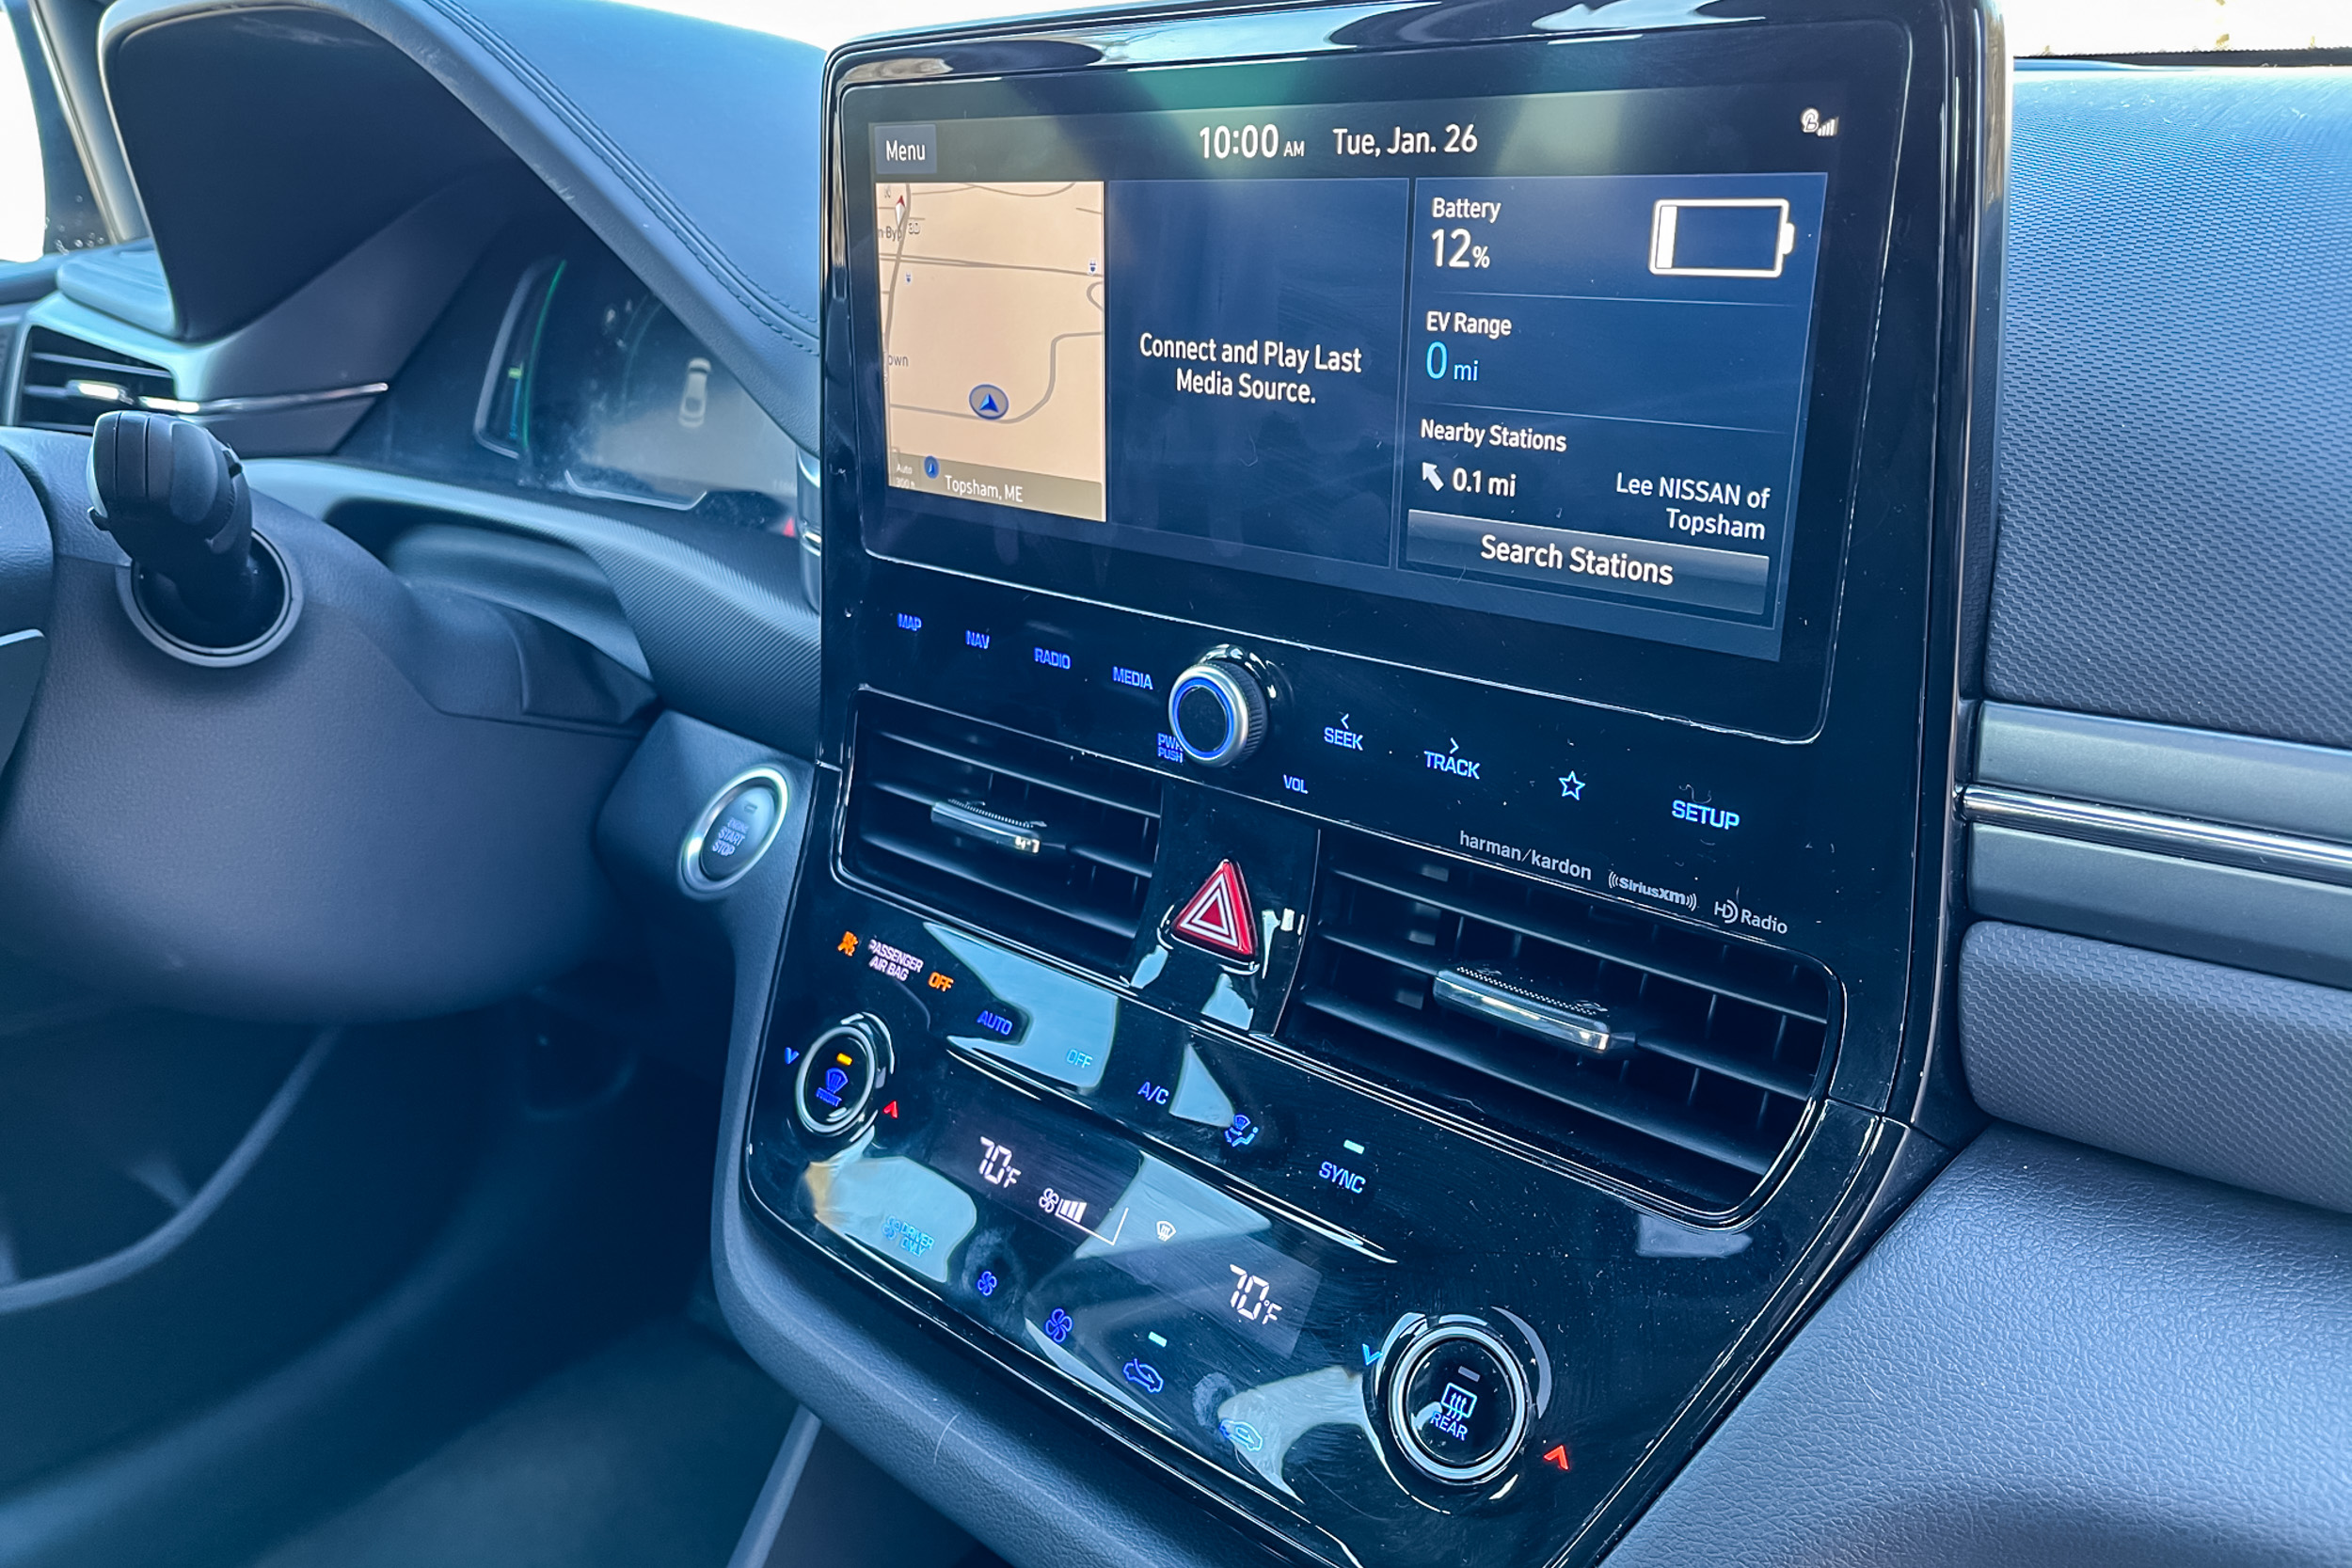 2021 Hyundai Ioniq PHEV Limited infotainment screen